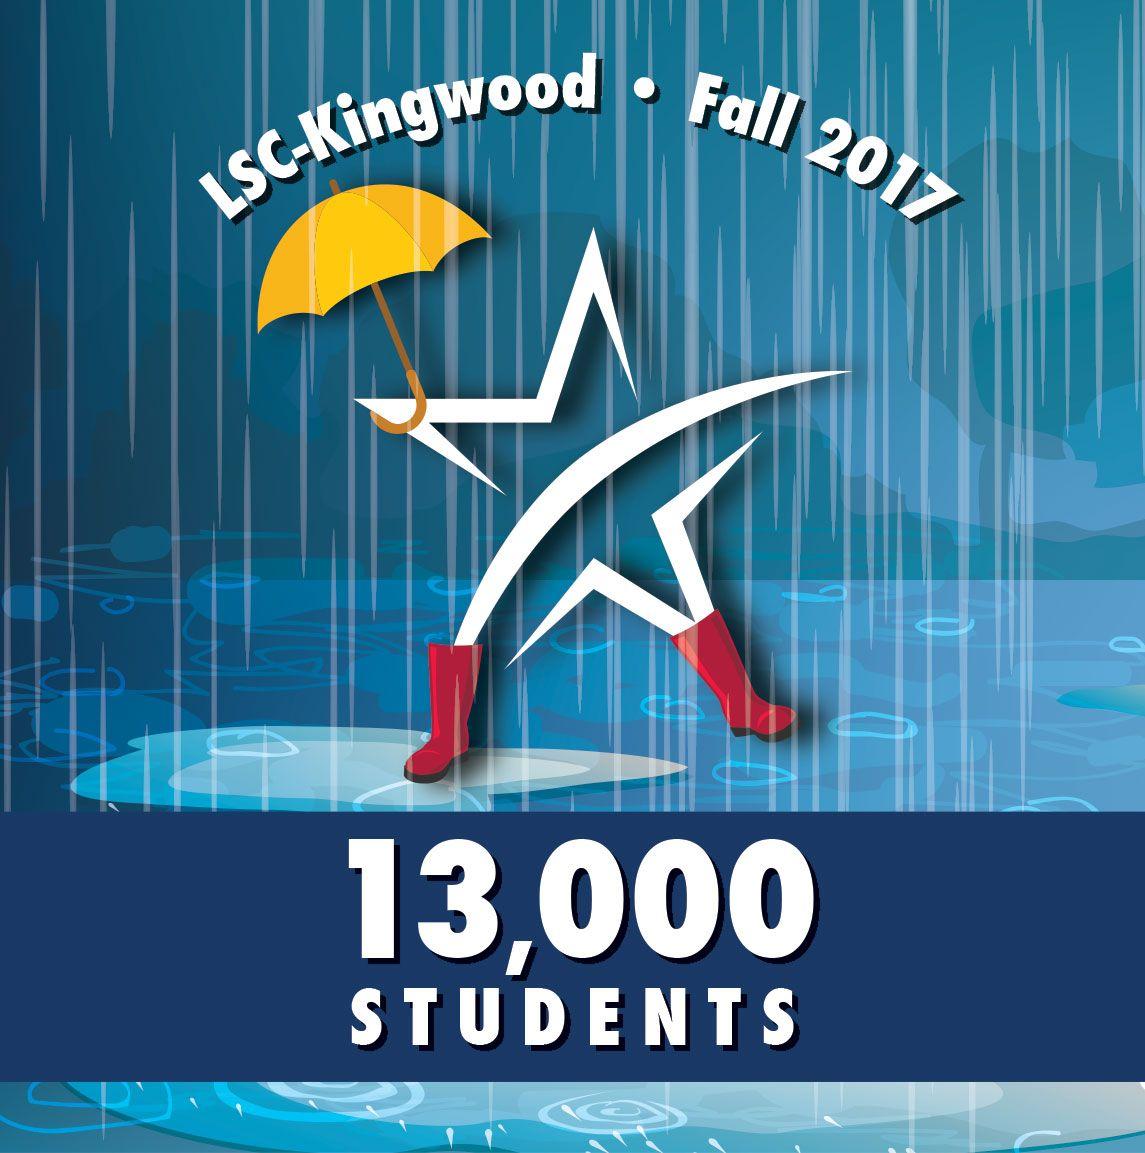 Milestone achieved! LSCKingwood has enrolled over 13,000